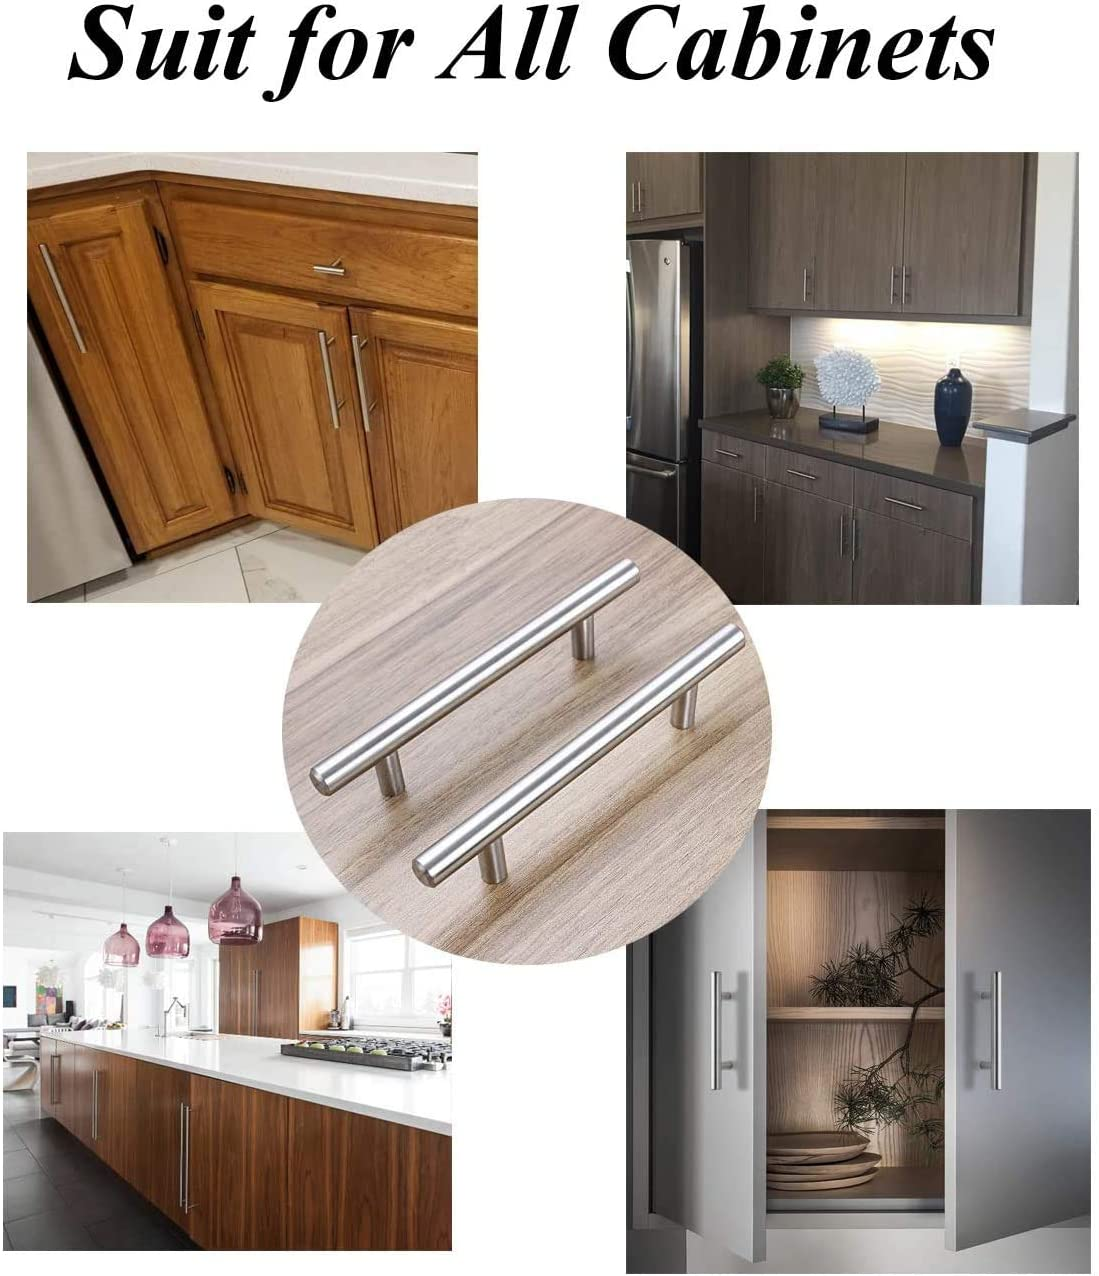 Buy Probrico 5 Pack 3 Solid Stainless Steel Cabinet Pulls T Bar Modern Euro Style Brushed Nickel Kitchen Cupboard Handles Dresser Drawer Pulls Kitchen Cabinet Hardware 5 Length Online In Turkey B01d4gkx08